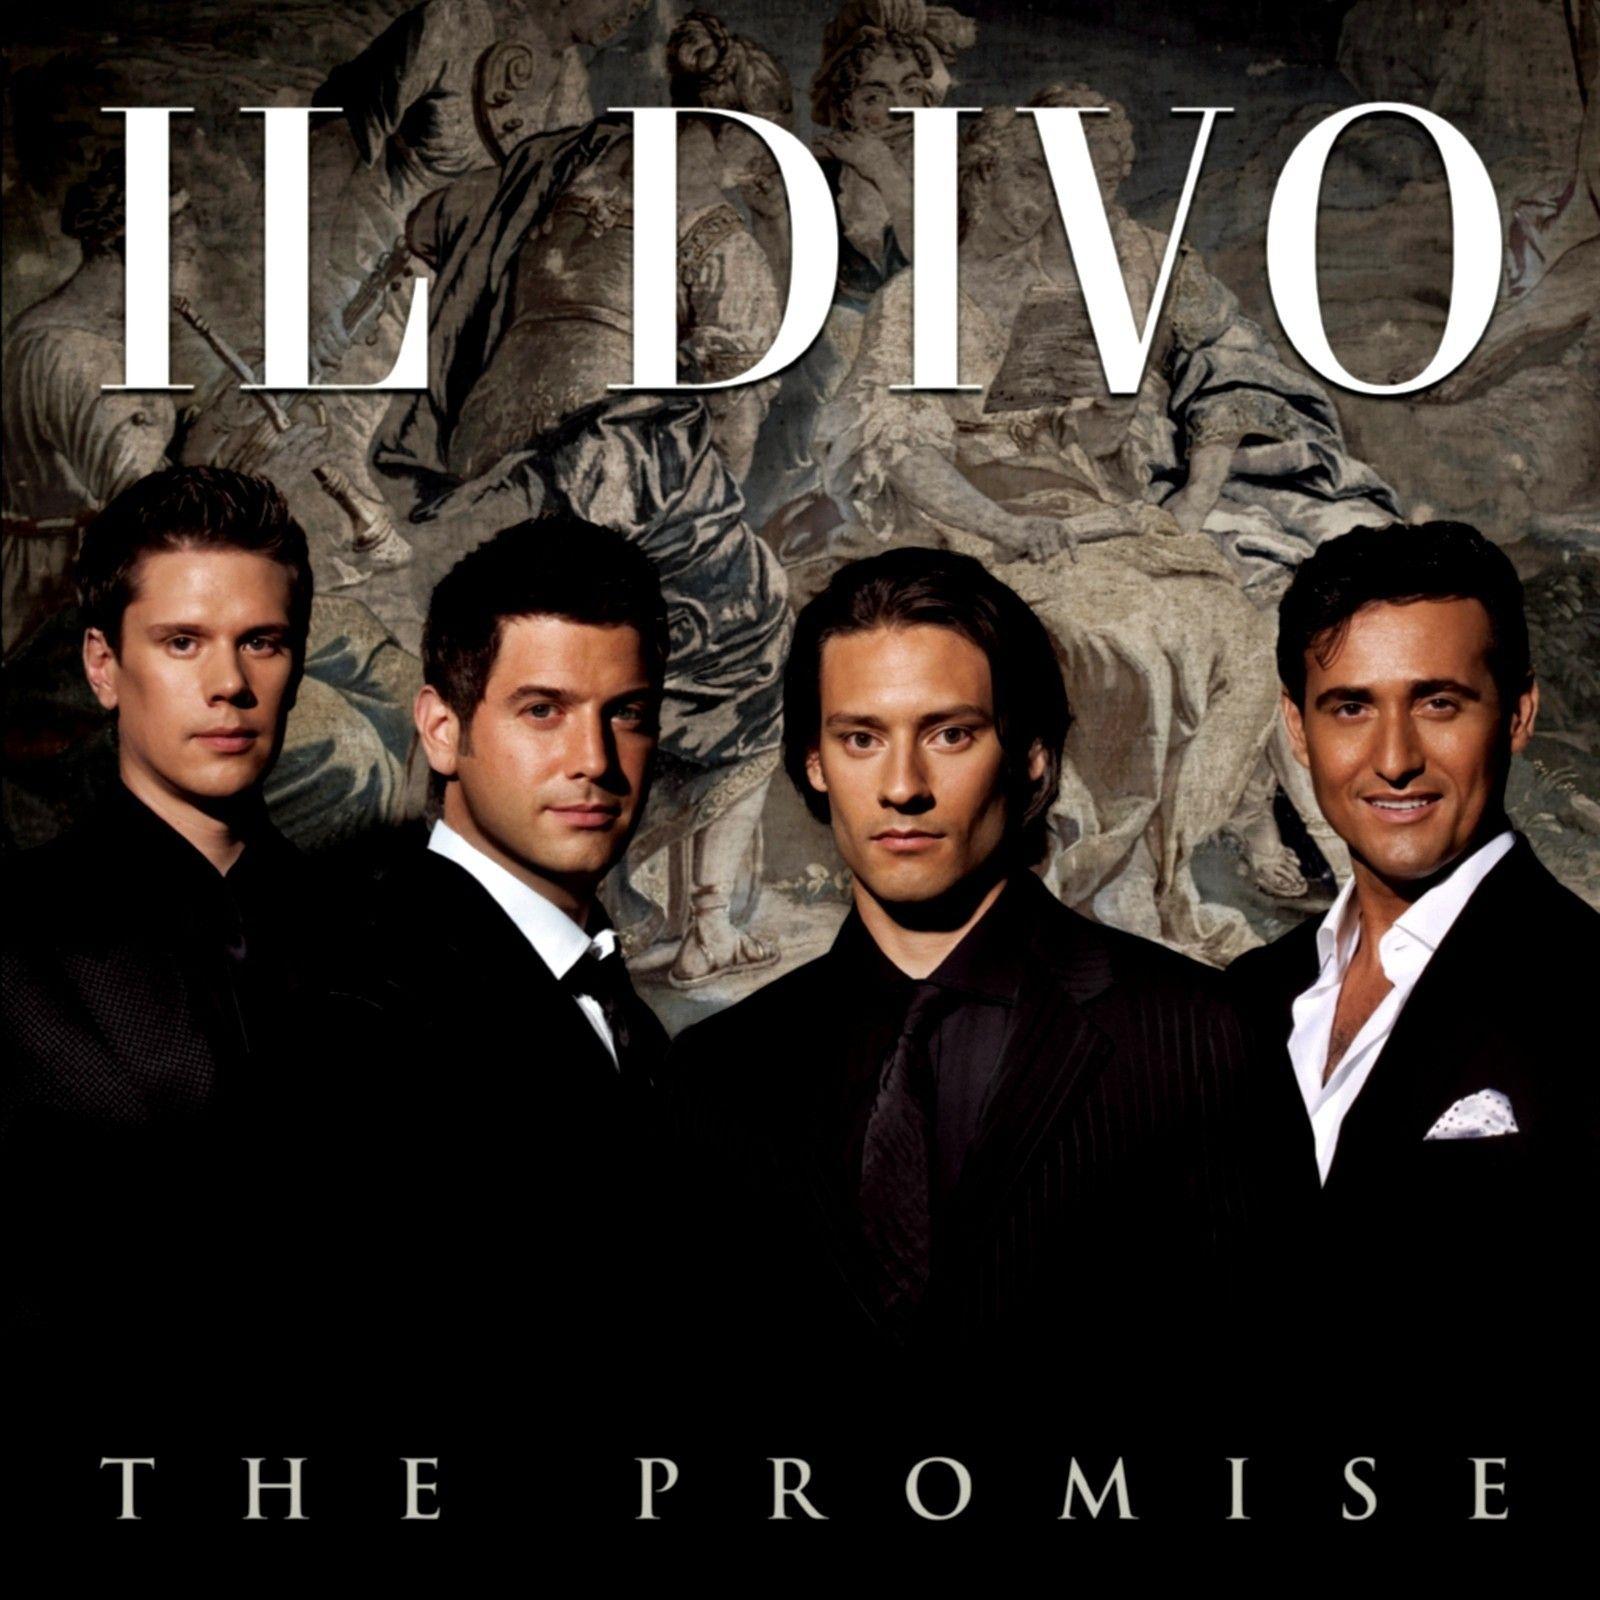 Il Divo - The Promise album cover